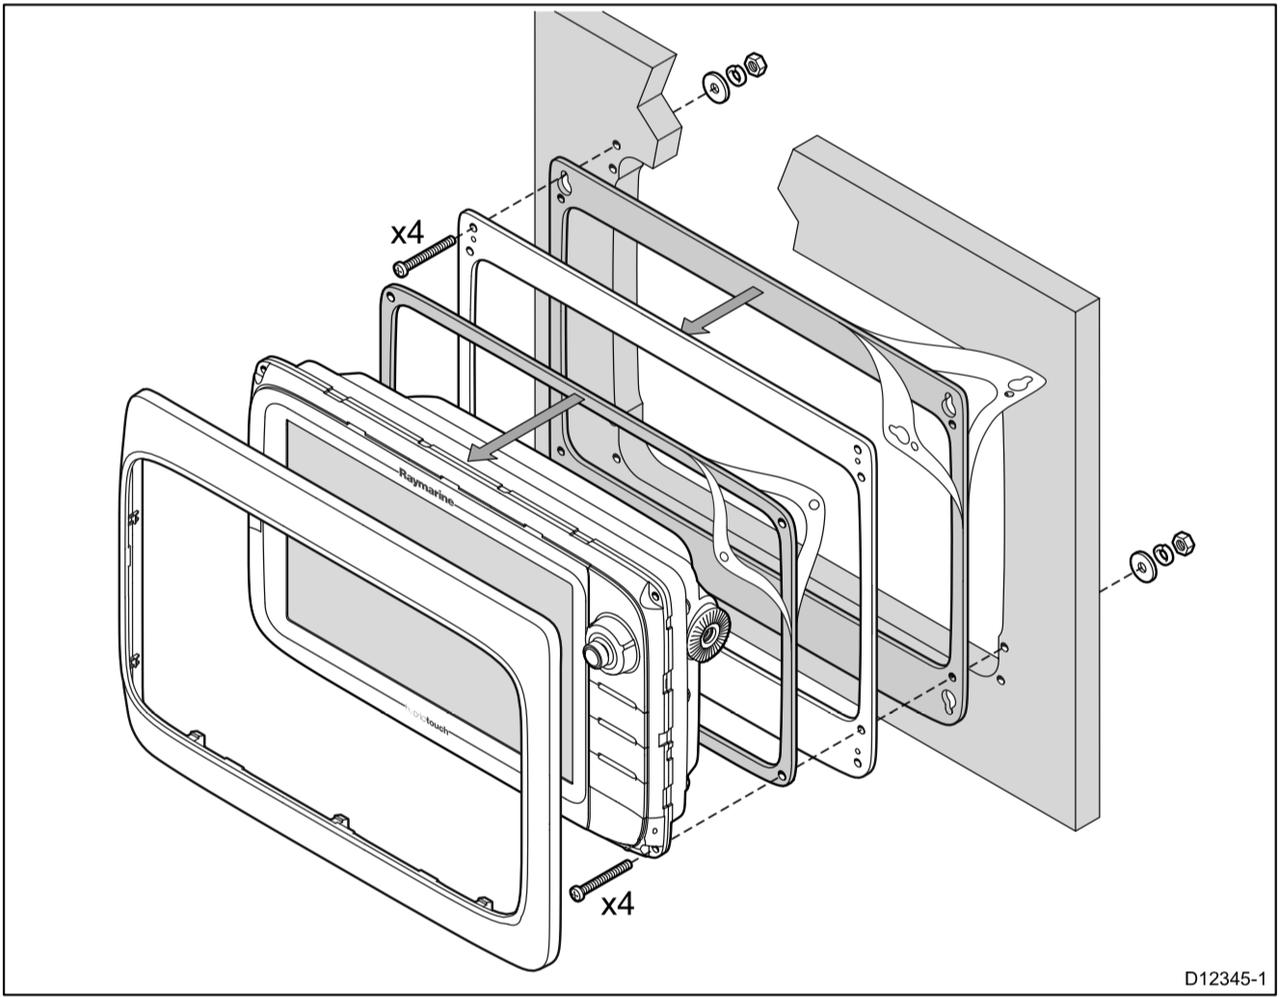 medium resolution of garmin 2010c chartplotter wiring diagrams wiring diagrams raymarine c9 e9 mounting adaptor kit for c80e80 cutout 86470 1437743912 1280 1280 c 2